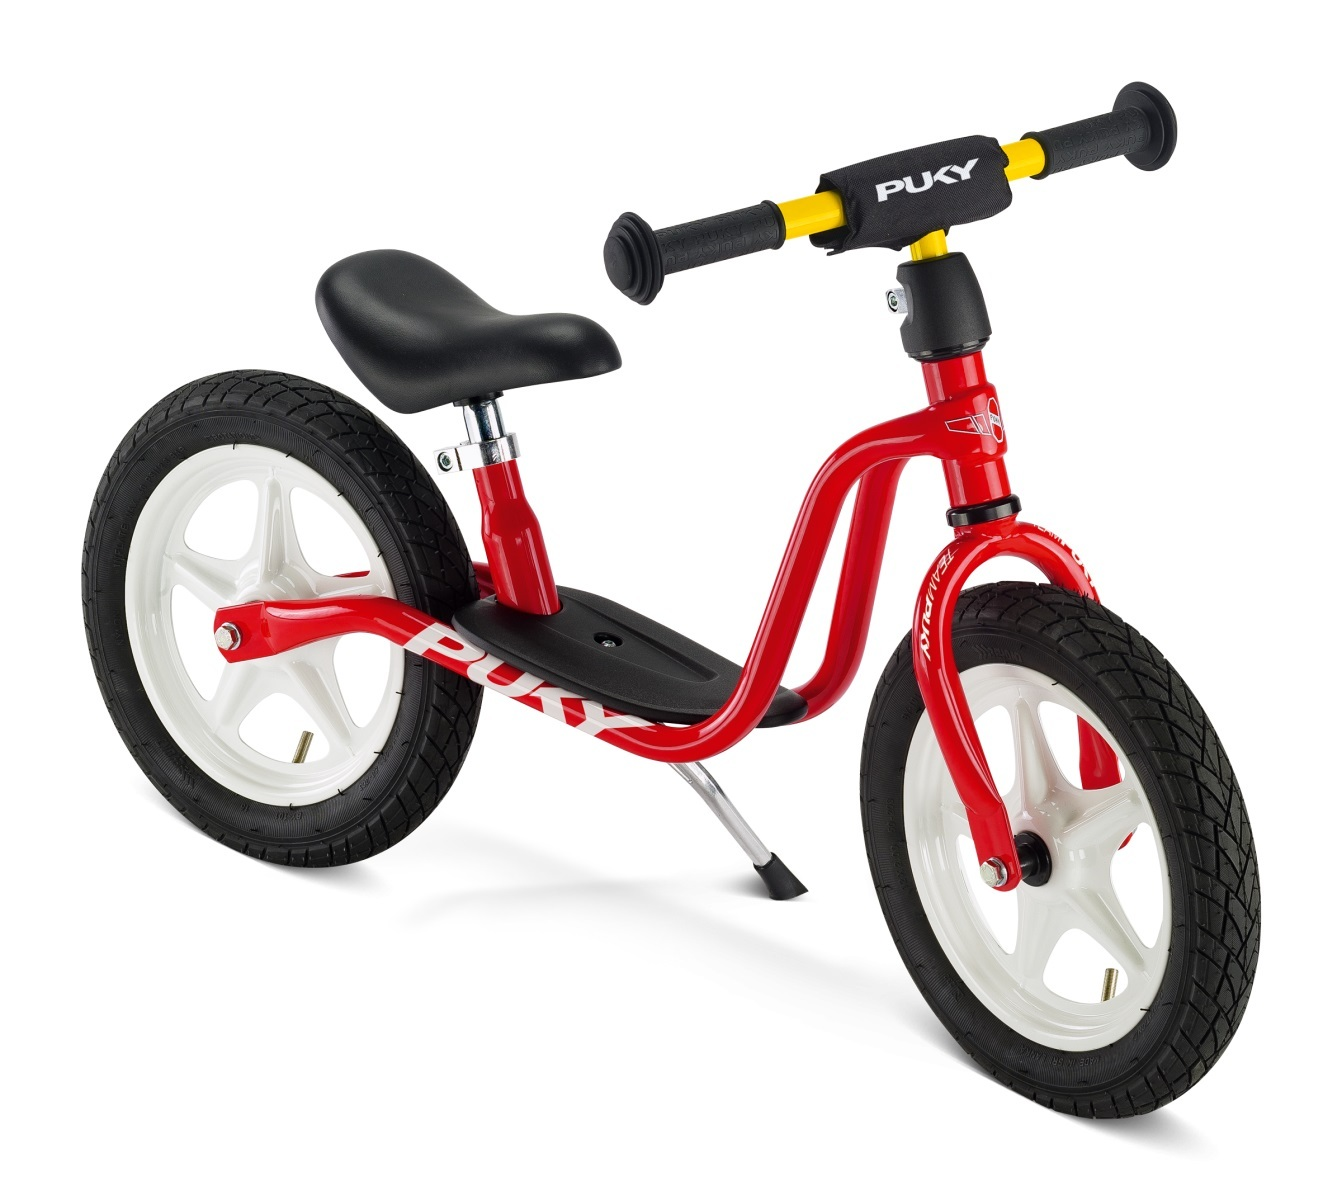 PUKY Odrážadlo Learner Bike Standard LR 1L red